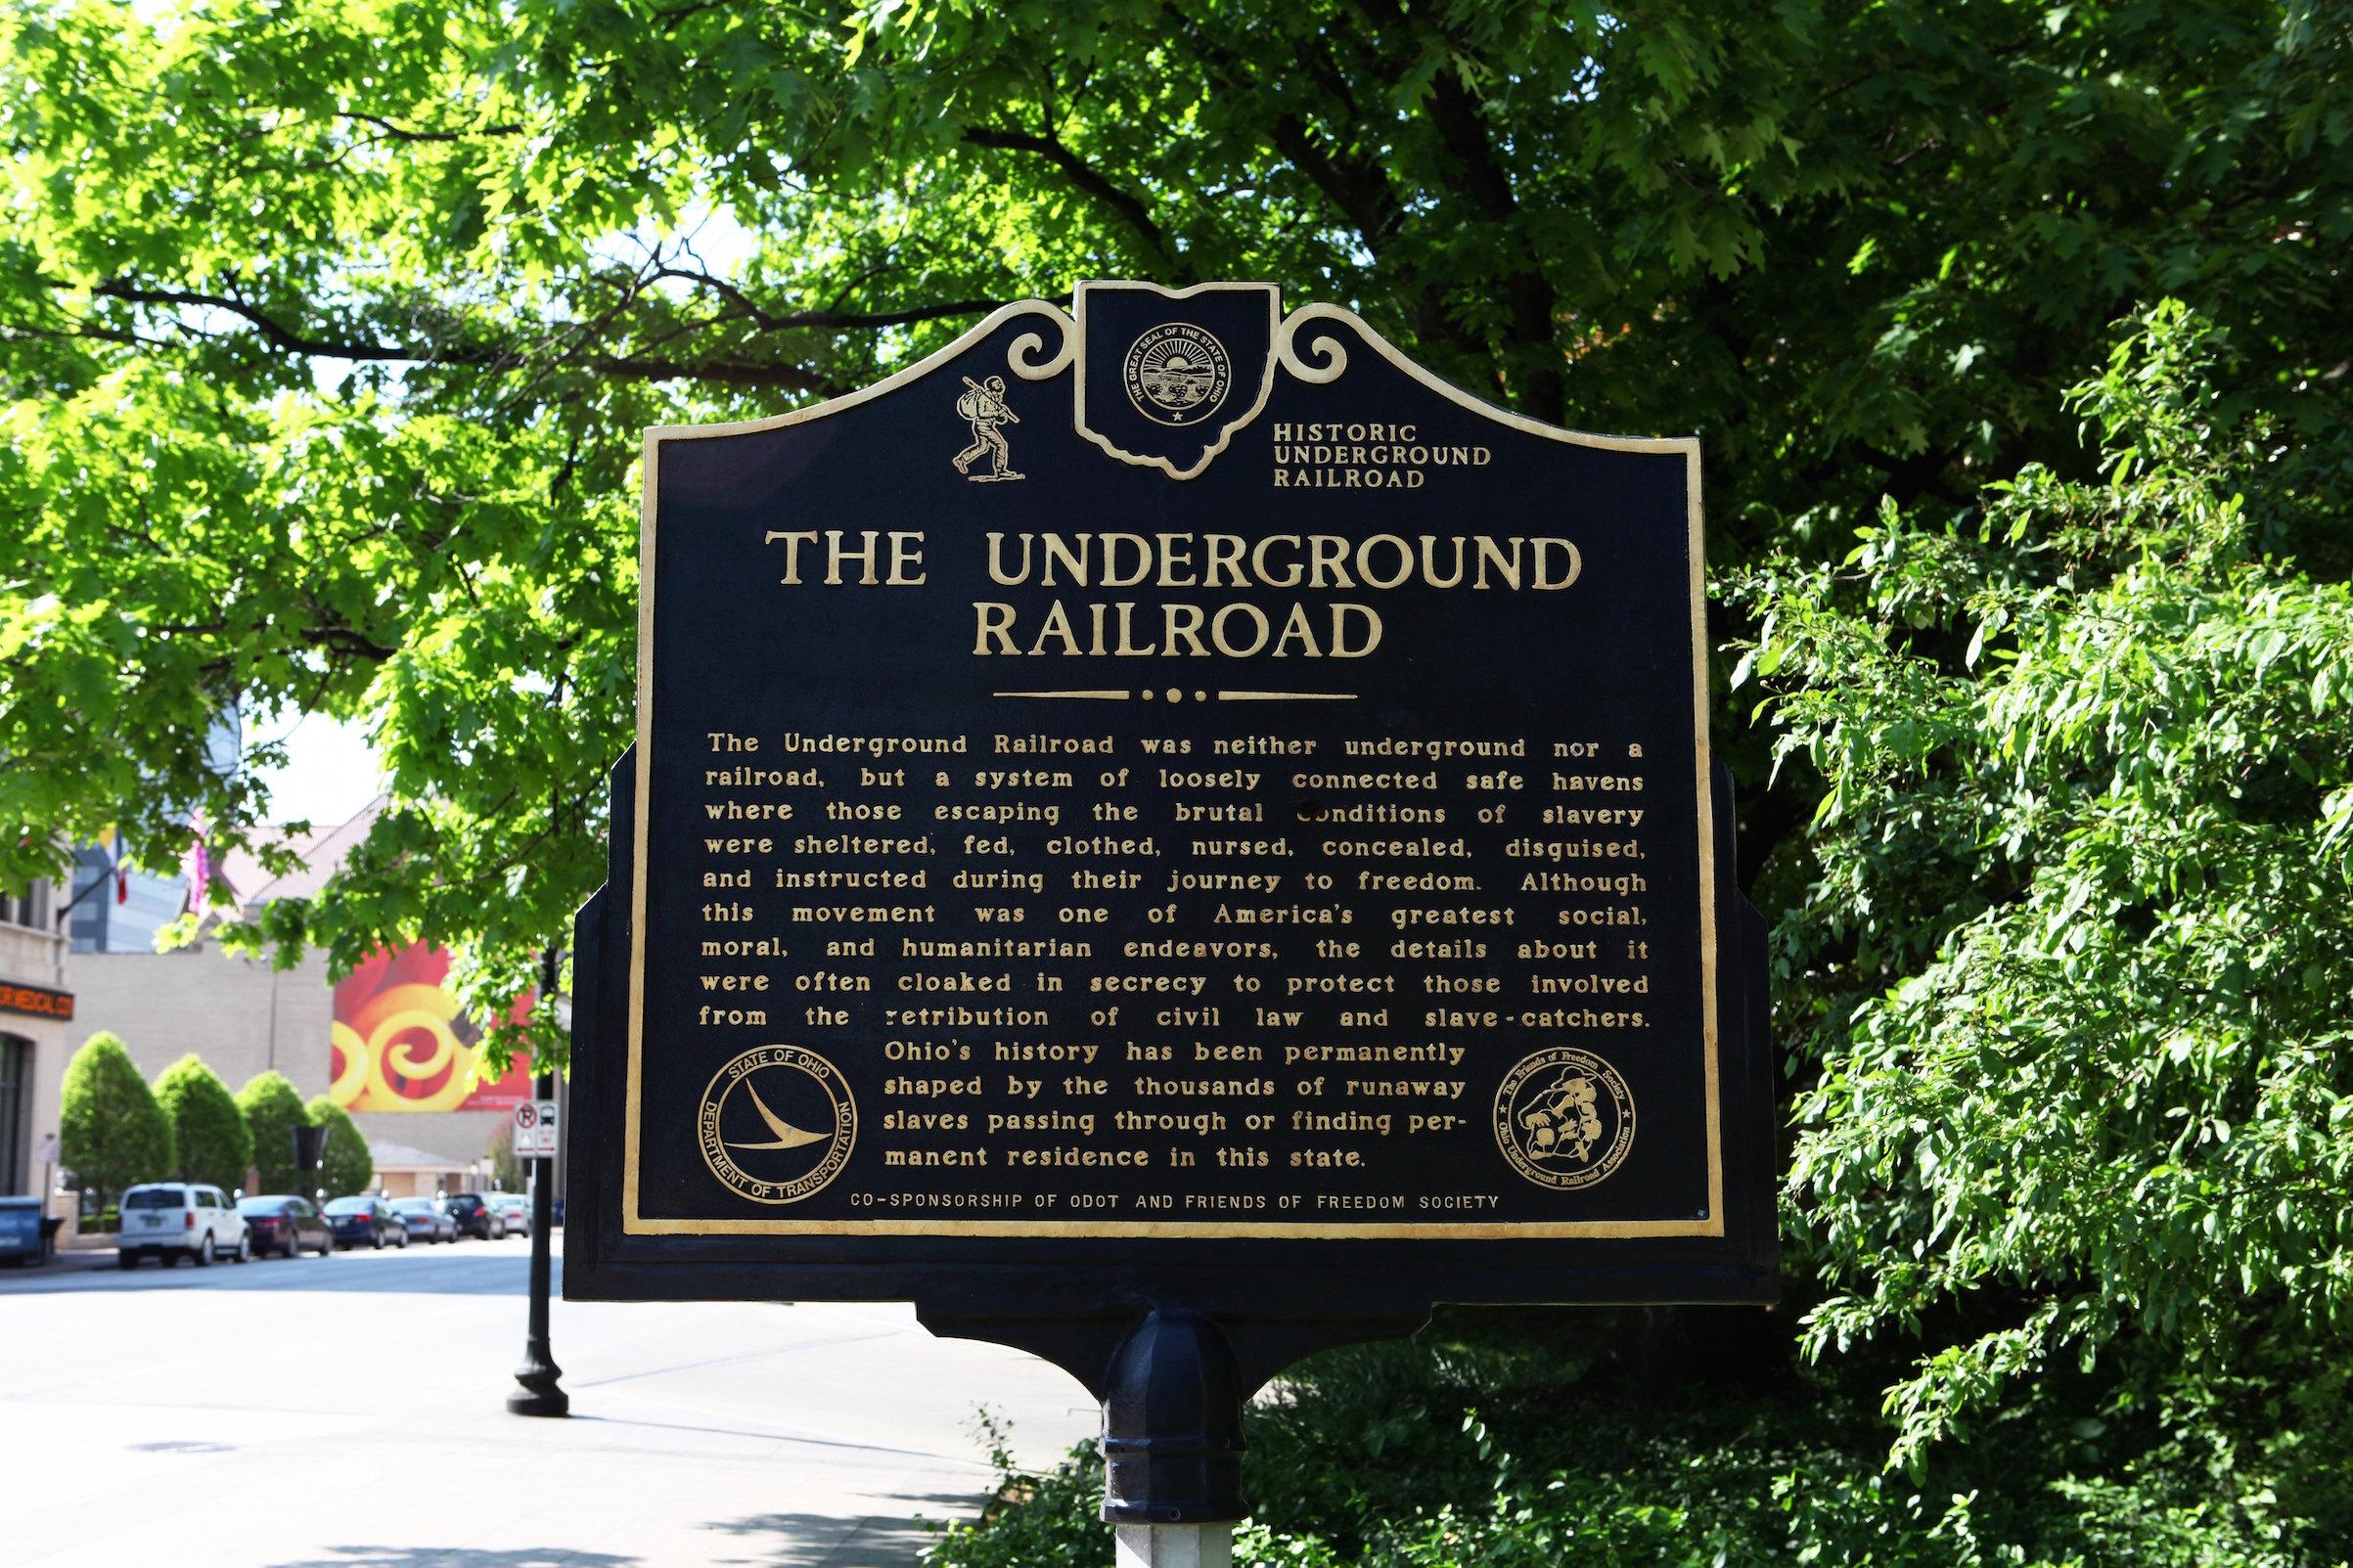 An Underground Railroad historic marker on May 16, 2014 in Columbus, Ohio